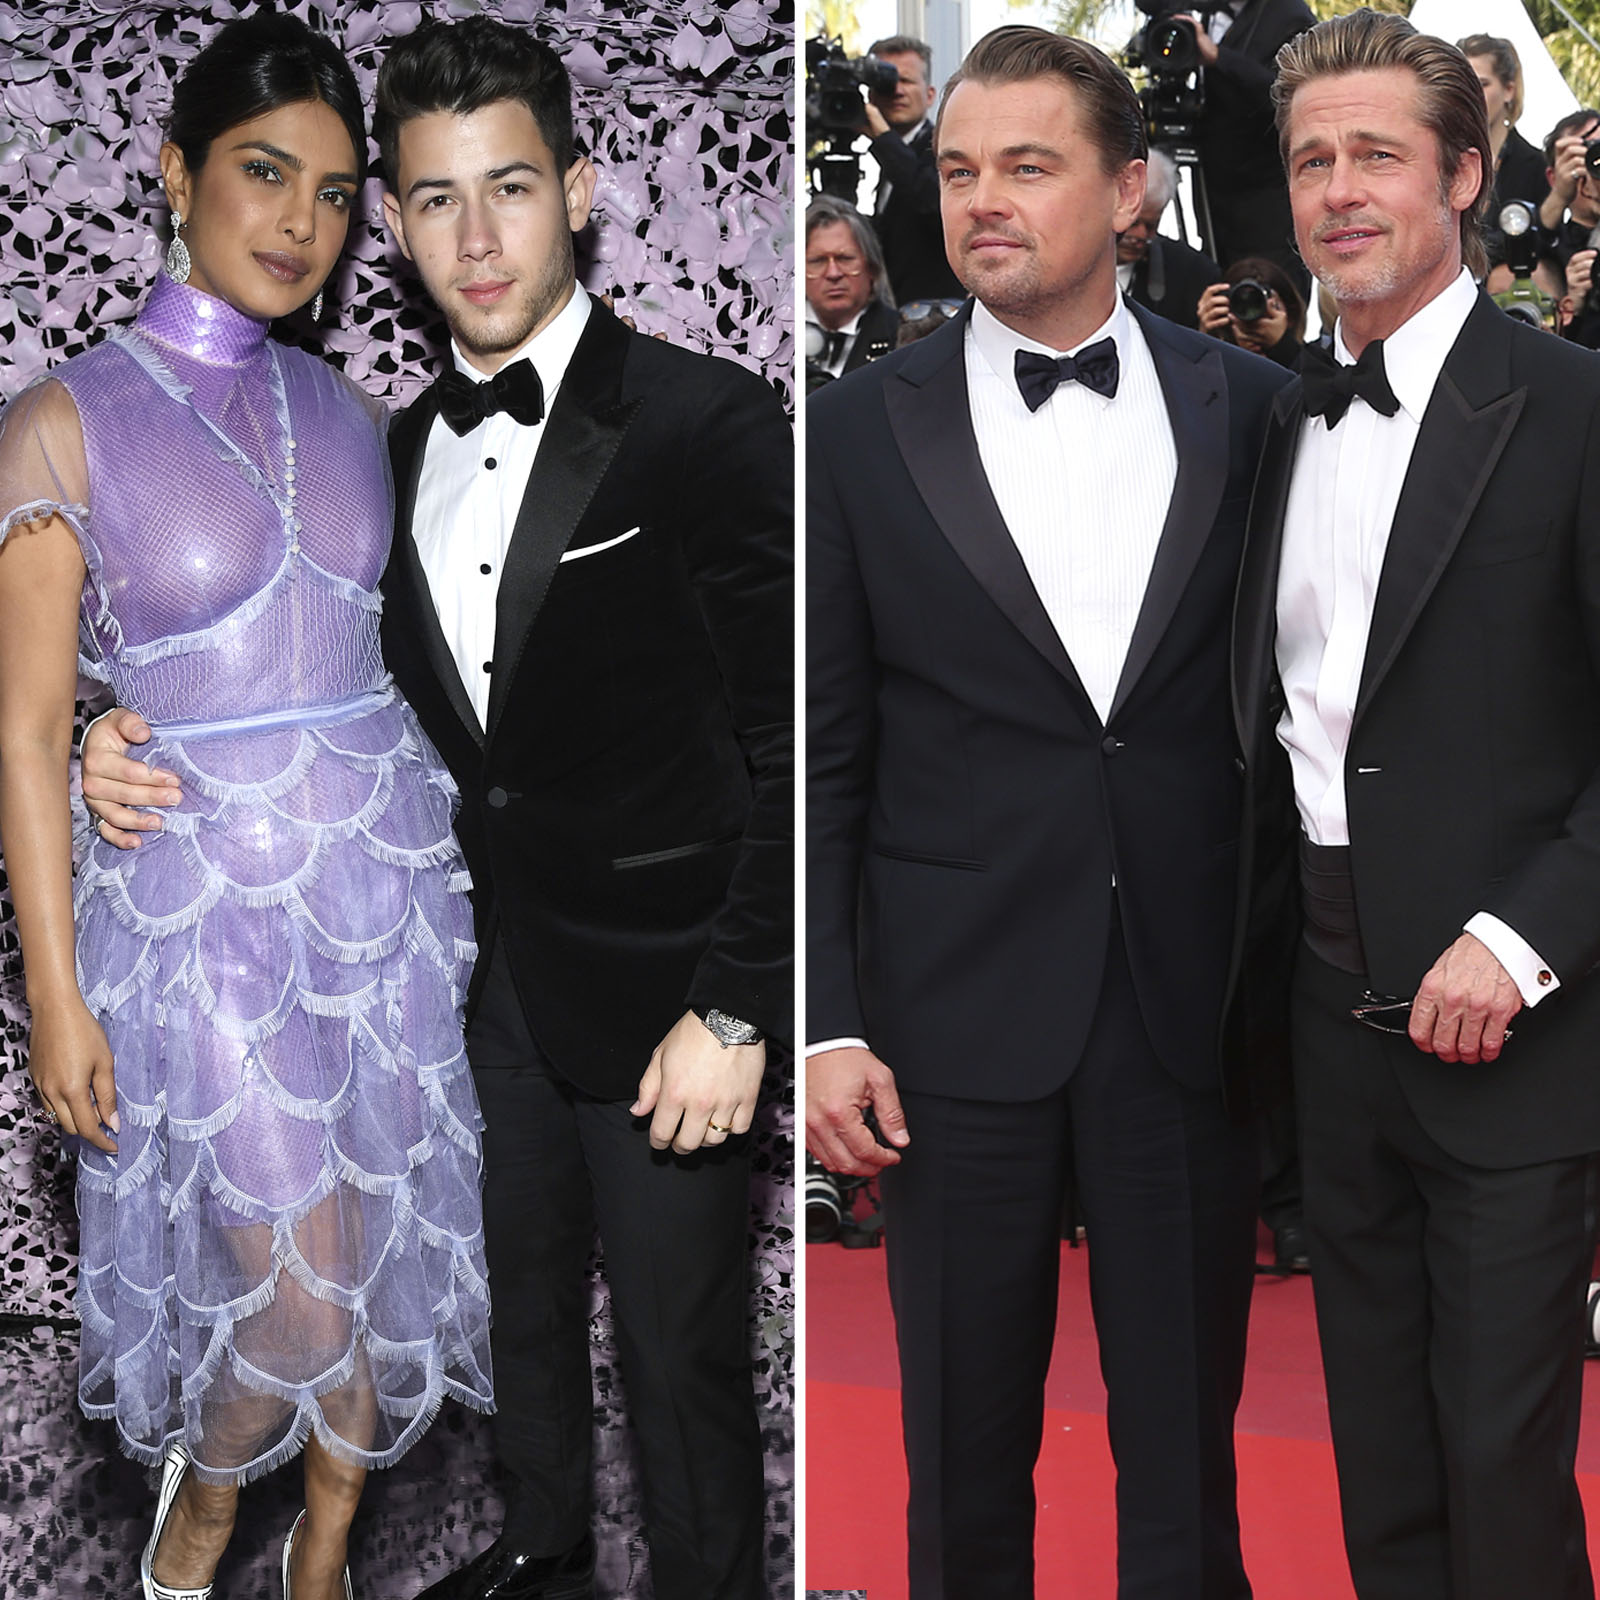 Priyanka Chopra y Nick Jonas y Leonardo DiCaprio y Brad Pitt